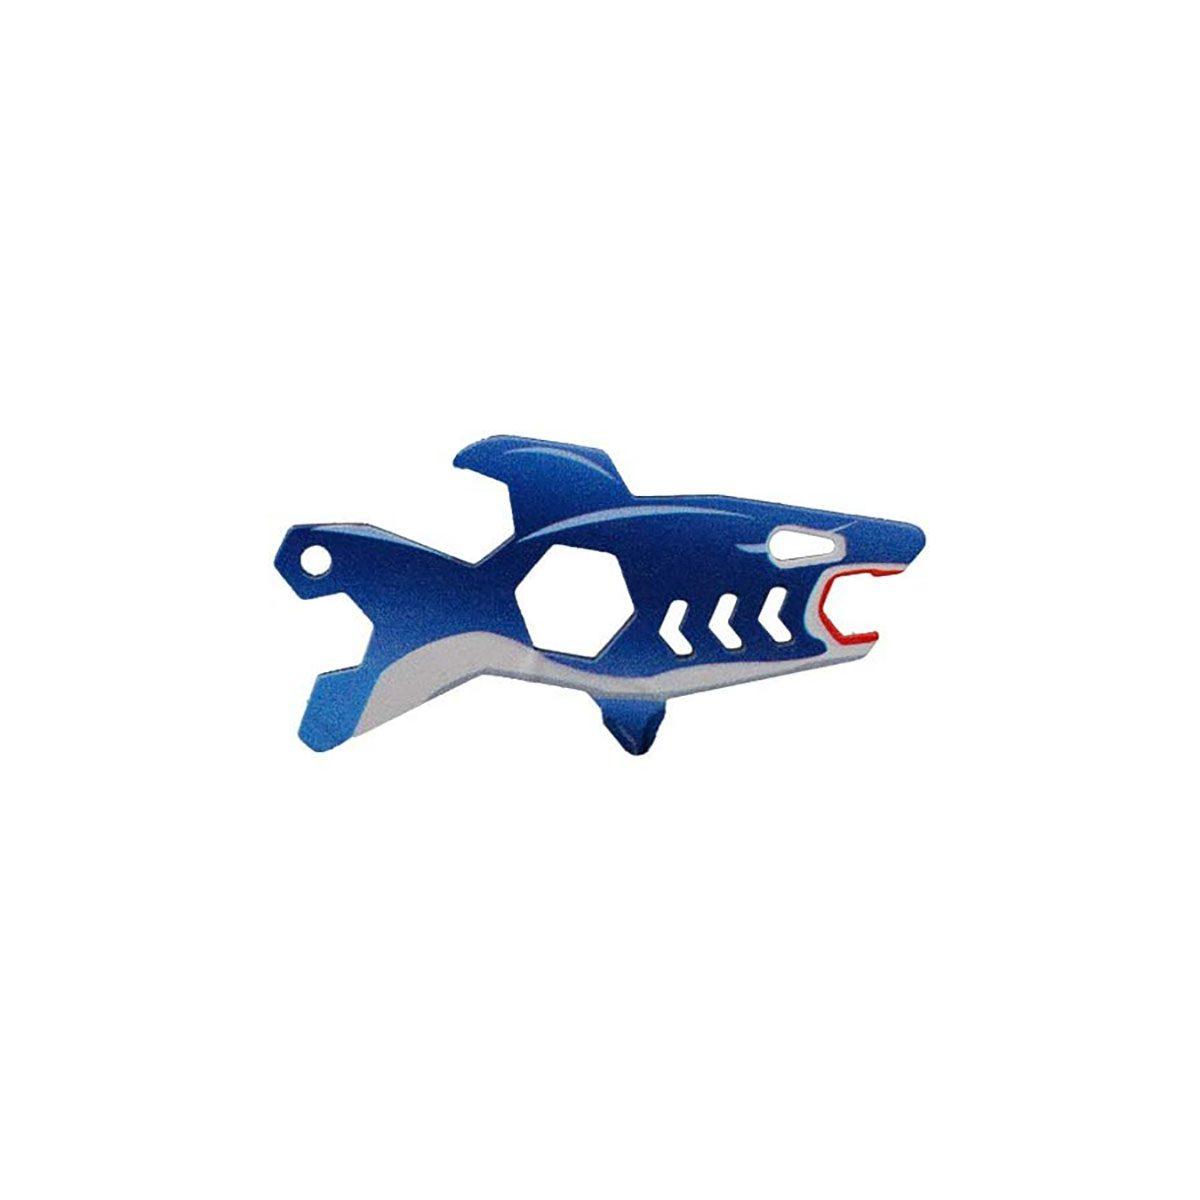 Shark multi-tool